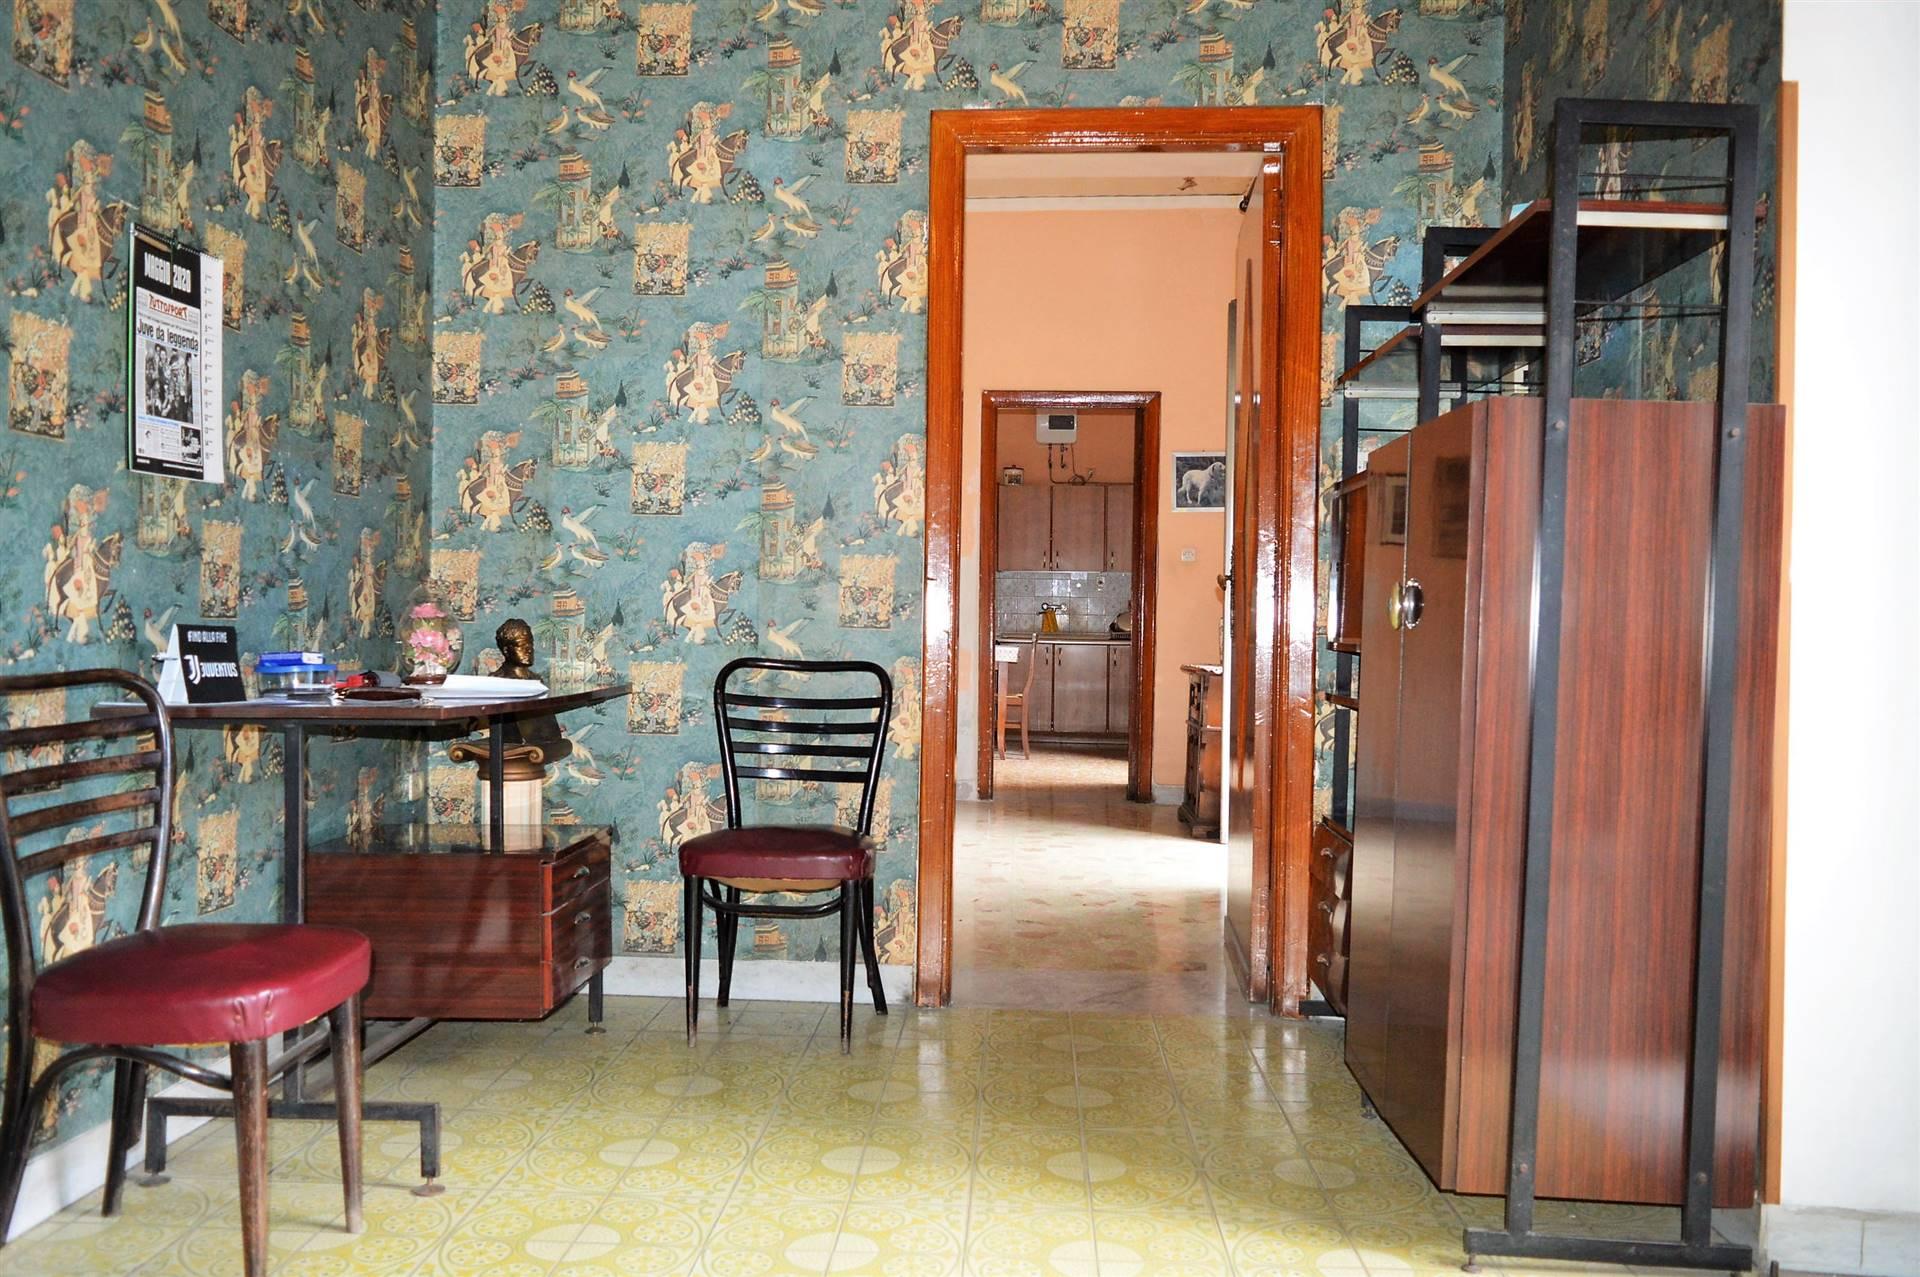 AV949A-Appartamento-SANTA-MARIA-CAPUA-VETERE-Via-Giuseppe-Avezzana